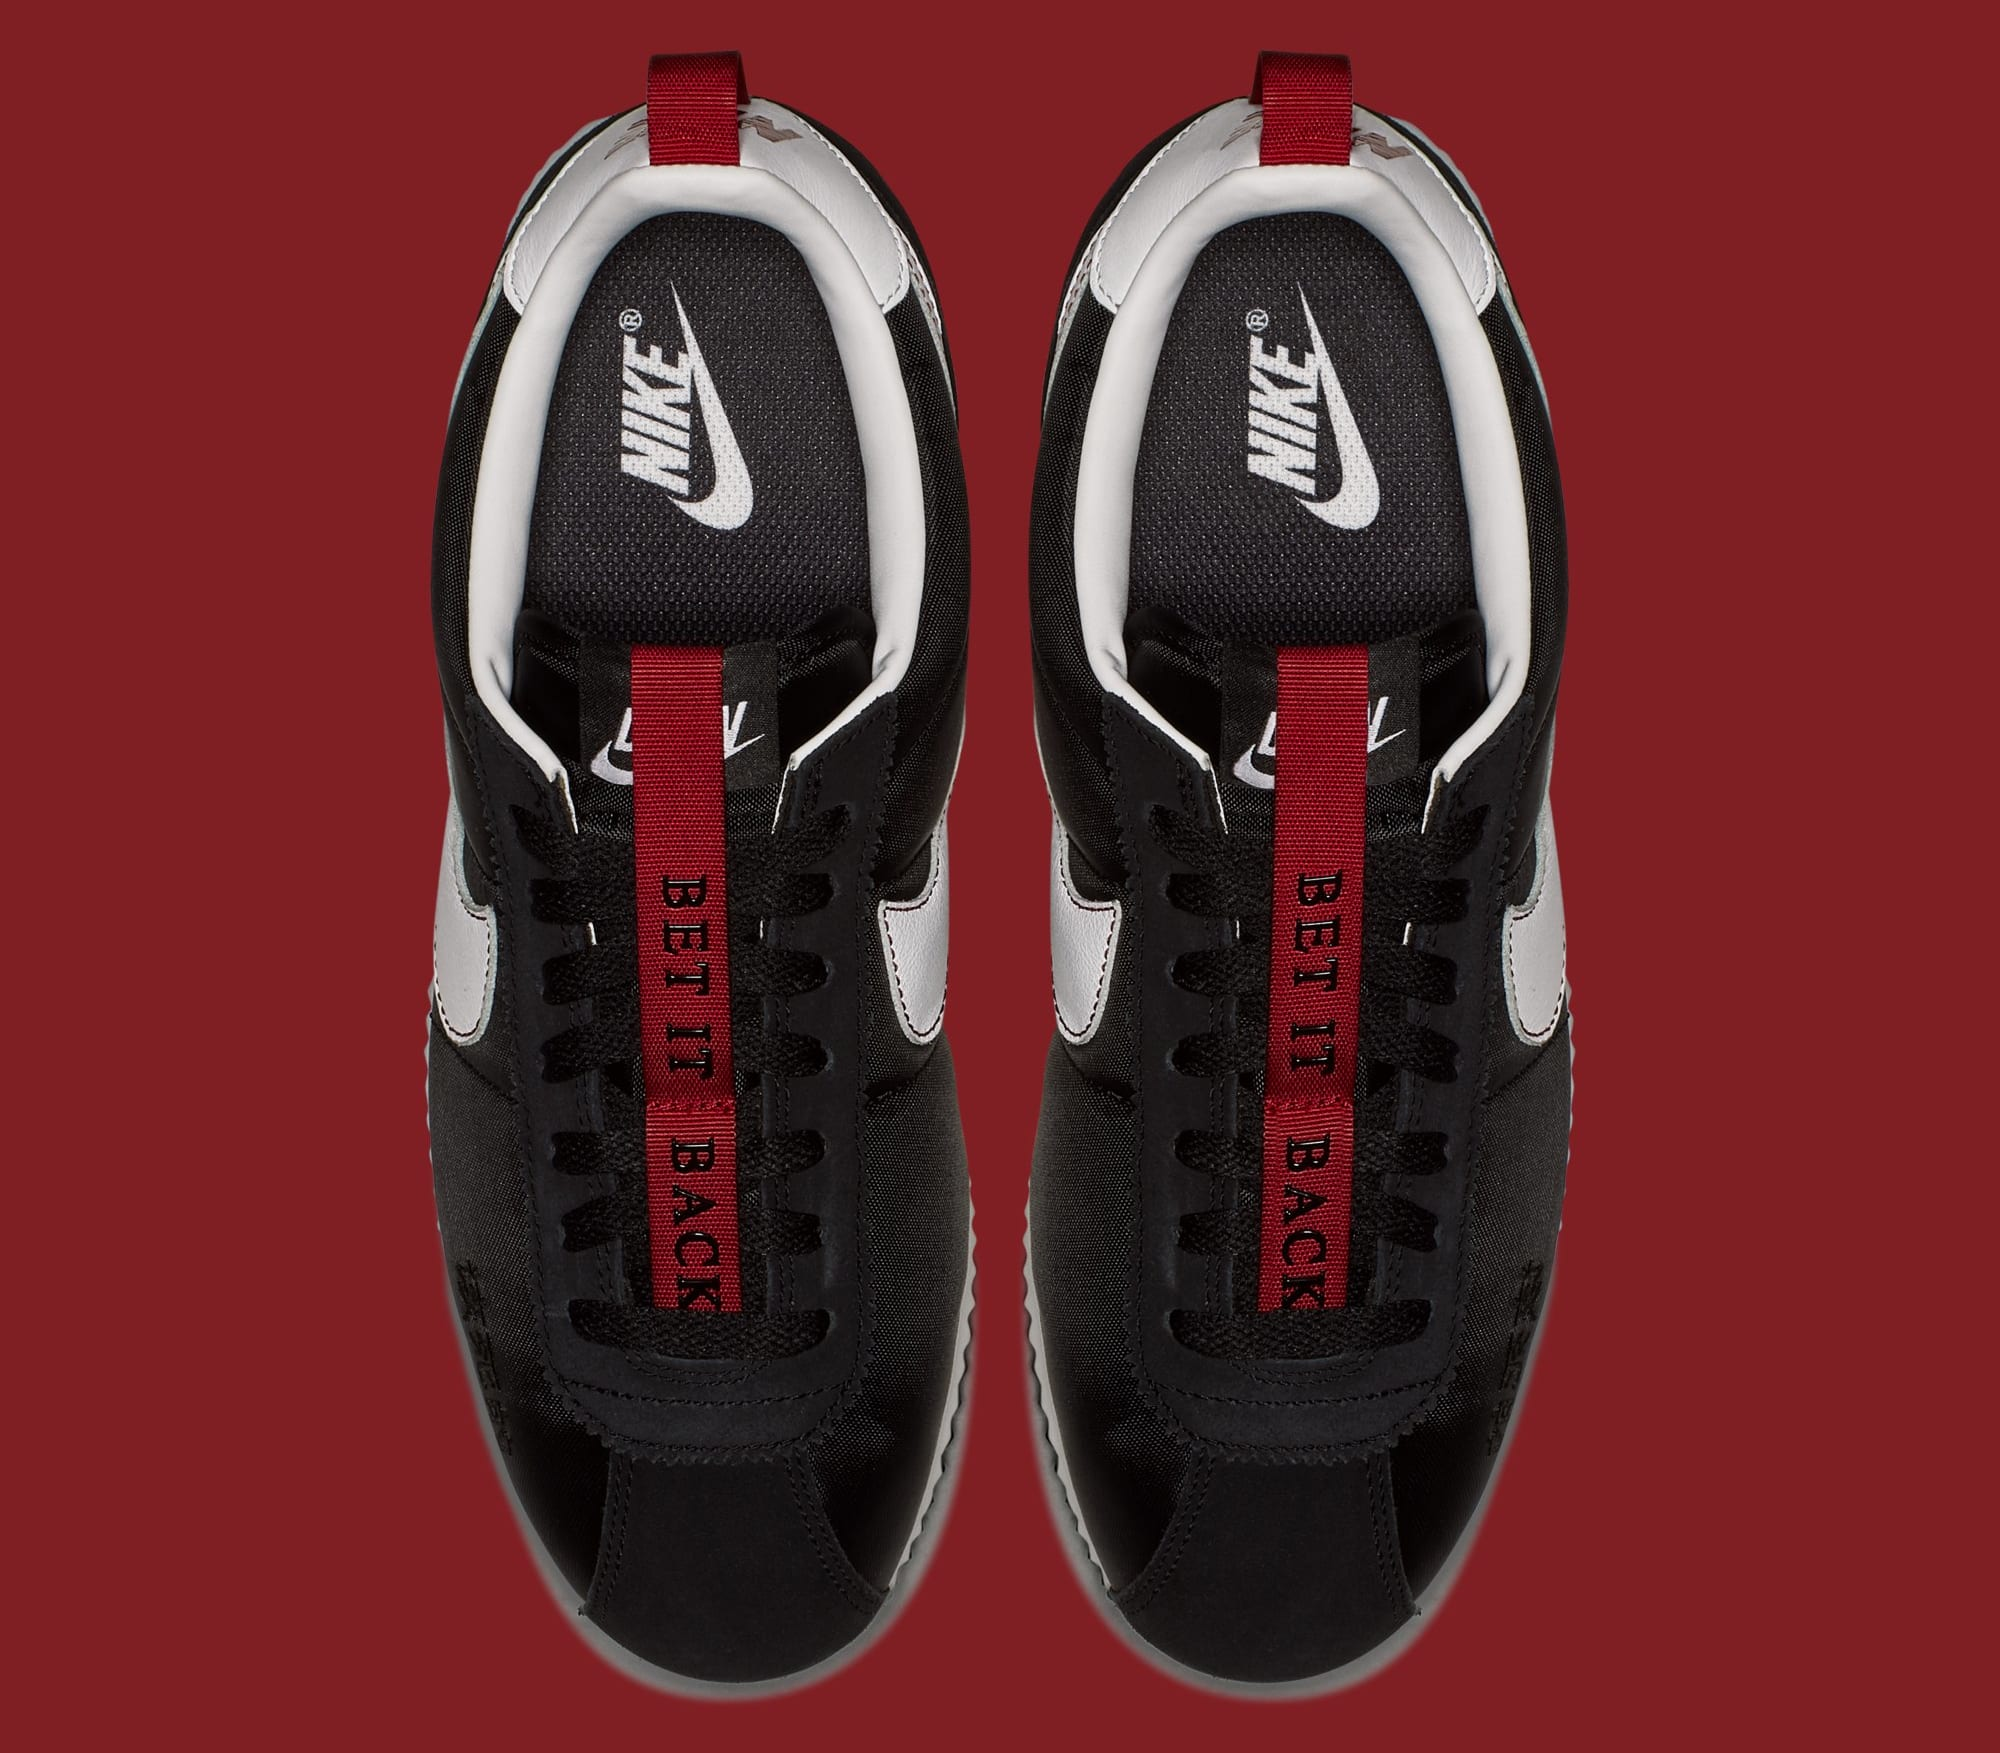 Kendrick Lamar x Nike Cortez Kenny 3 BV0833-016 (Top)